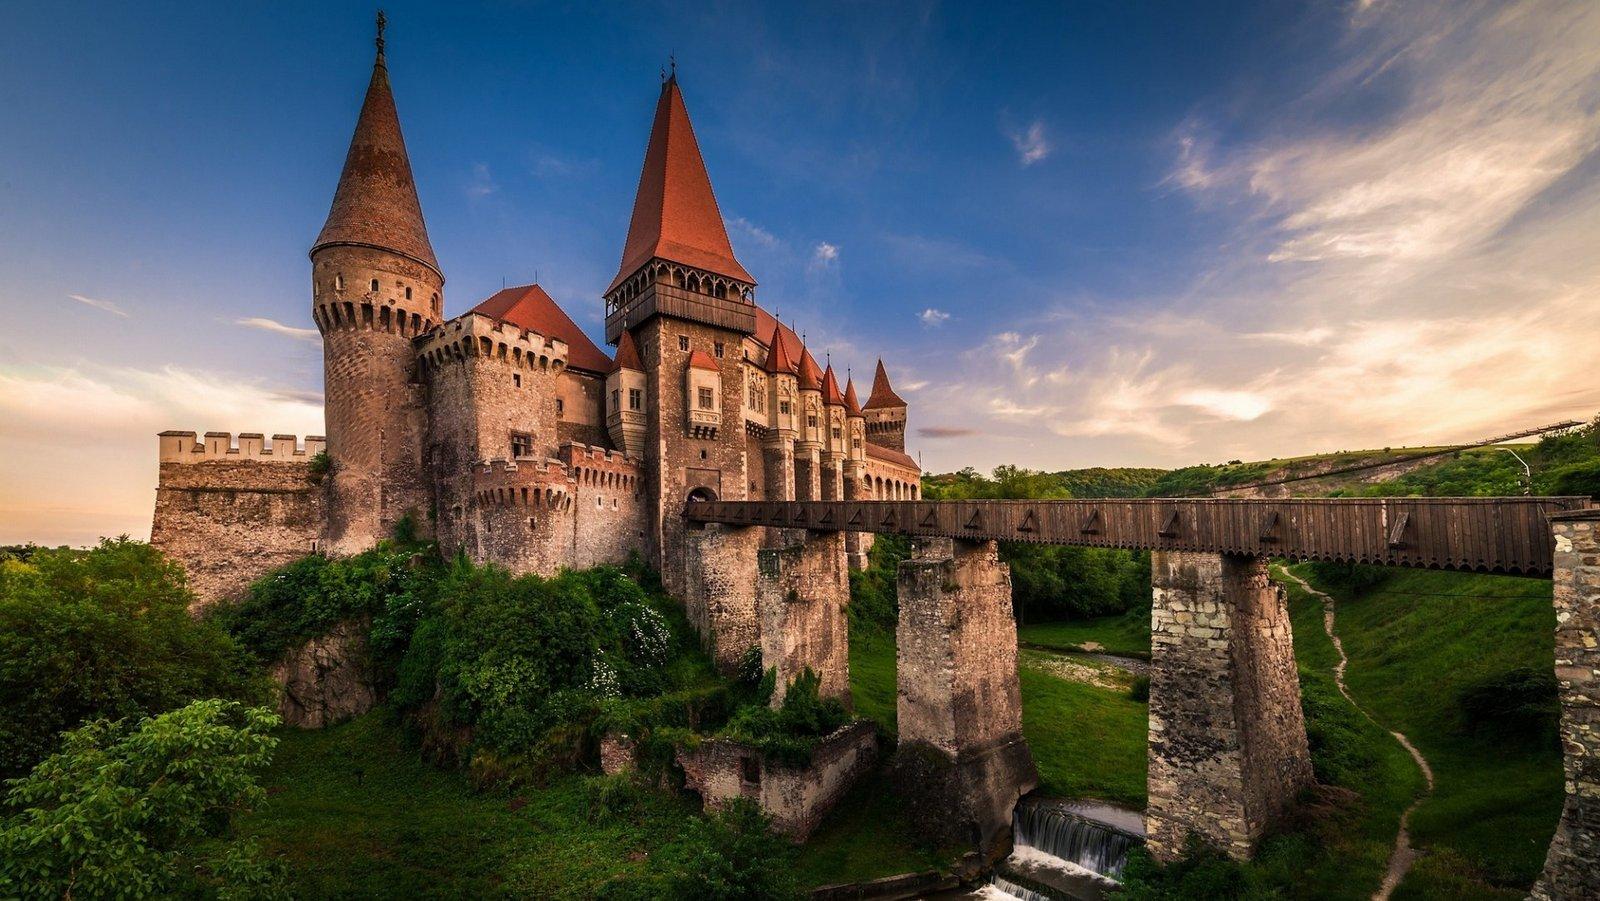 corvin-castle-ancient-castle-sunset-transylvania-romania-min